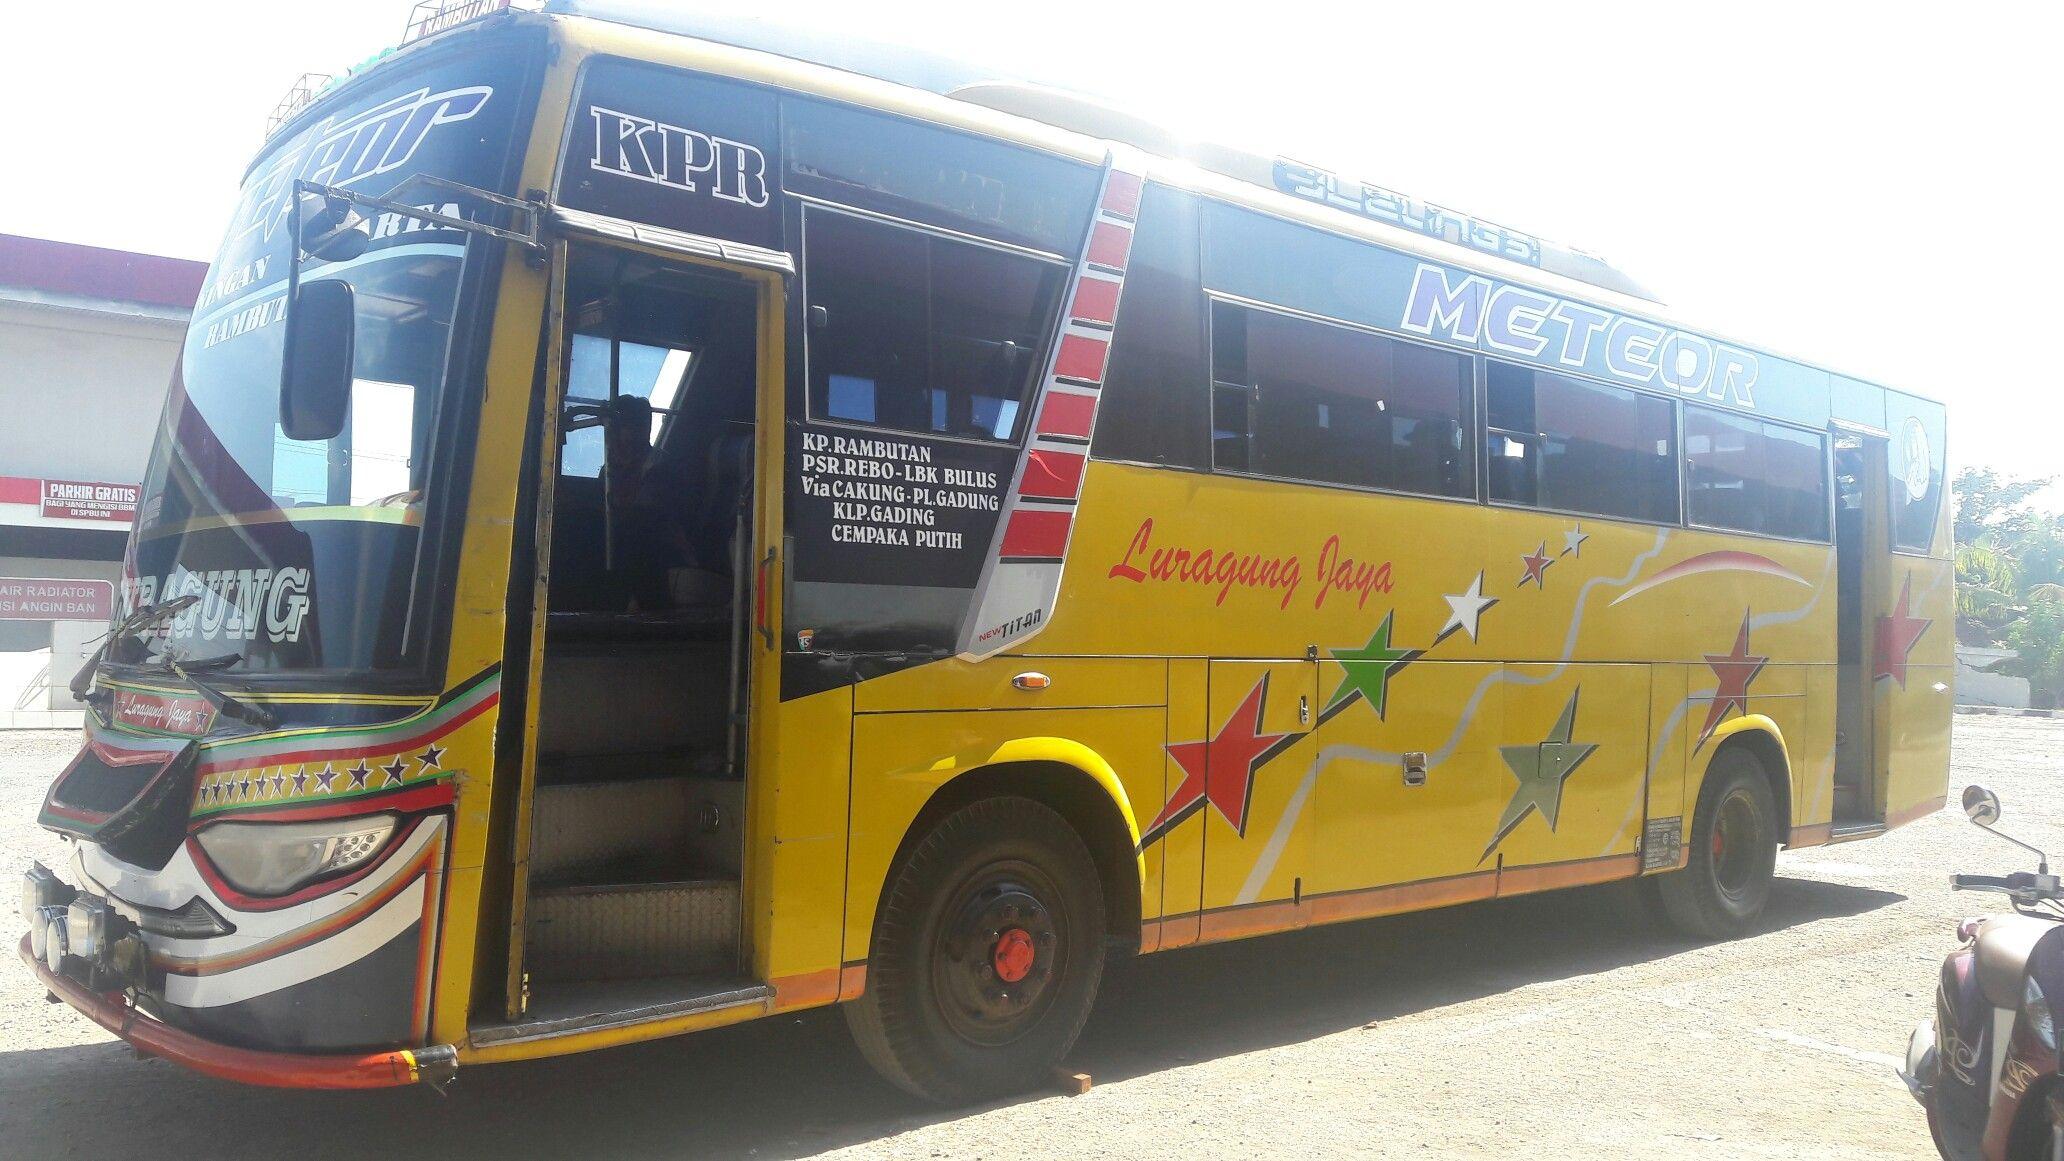 Luragung Jaya Bus Indonesia